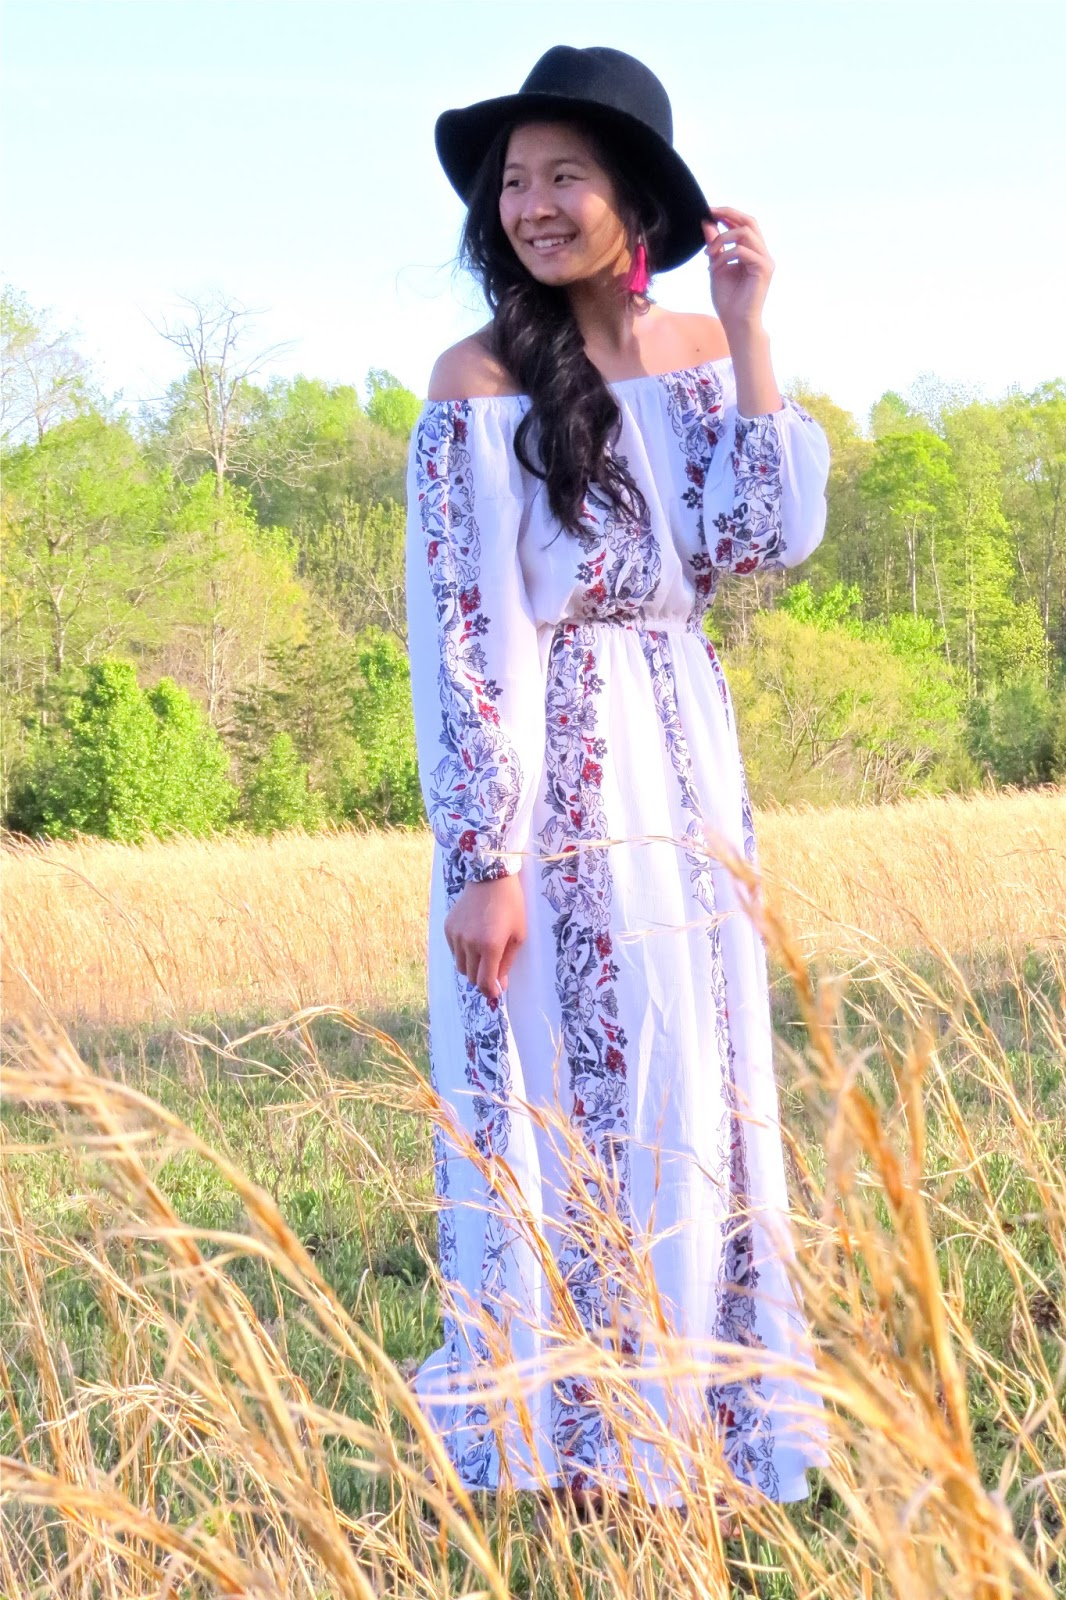 Boho_outfit_inspiration